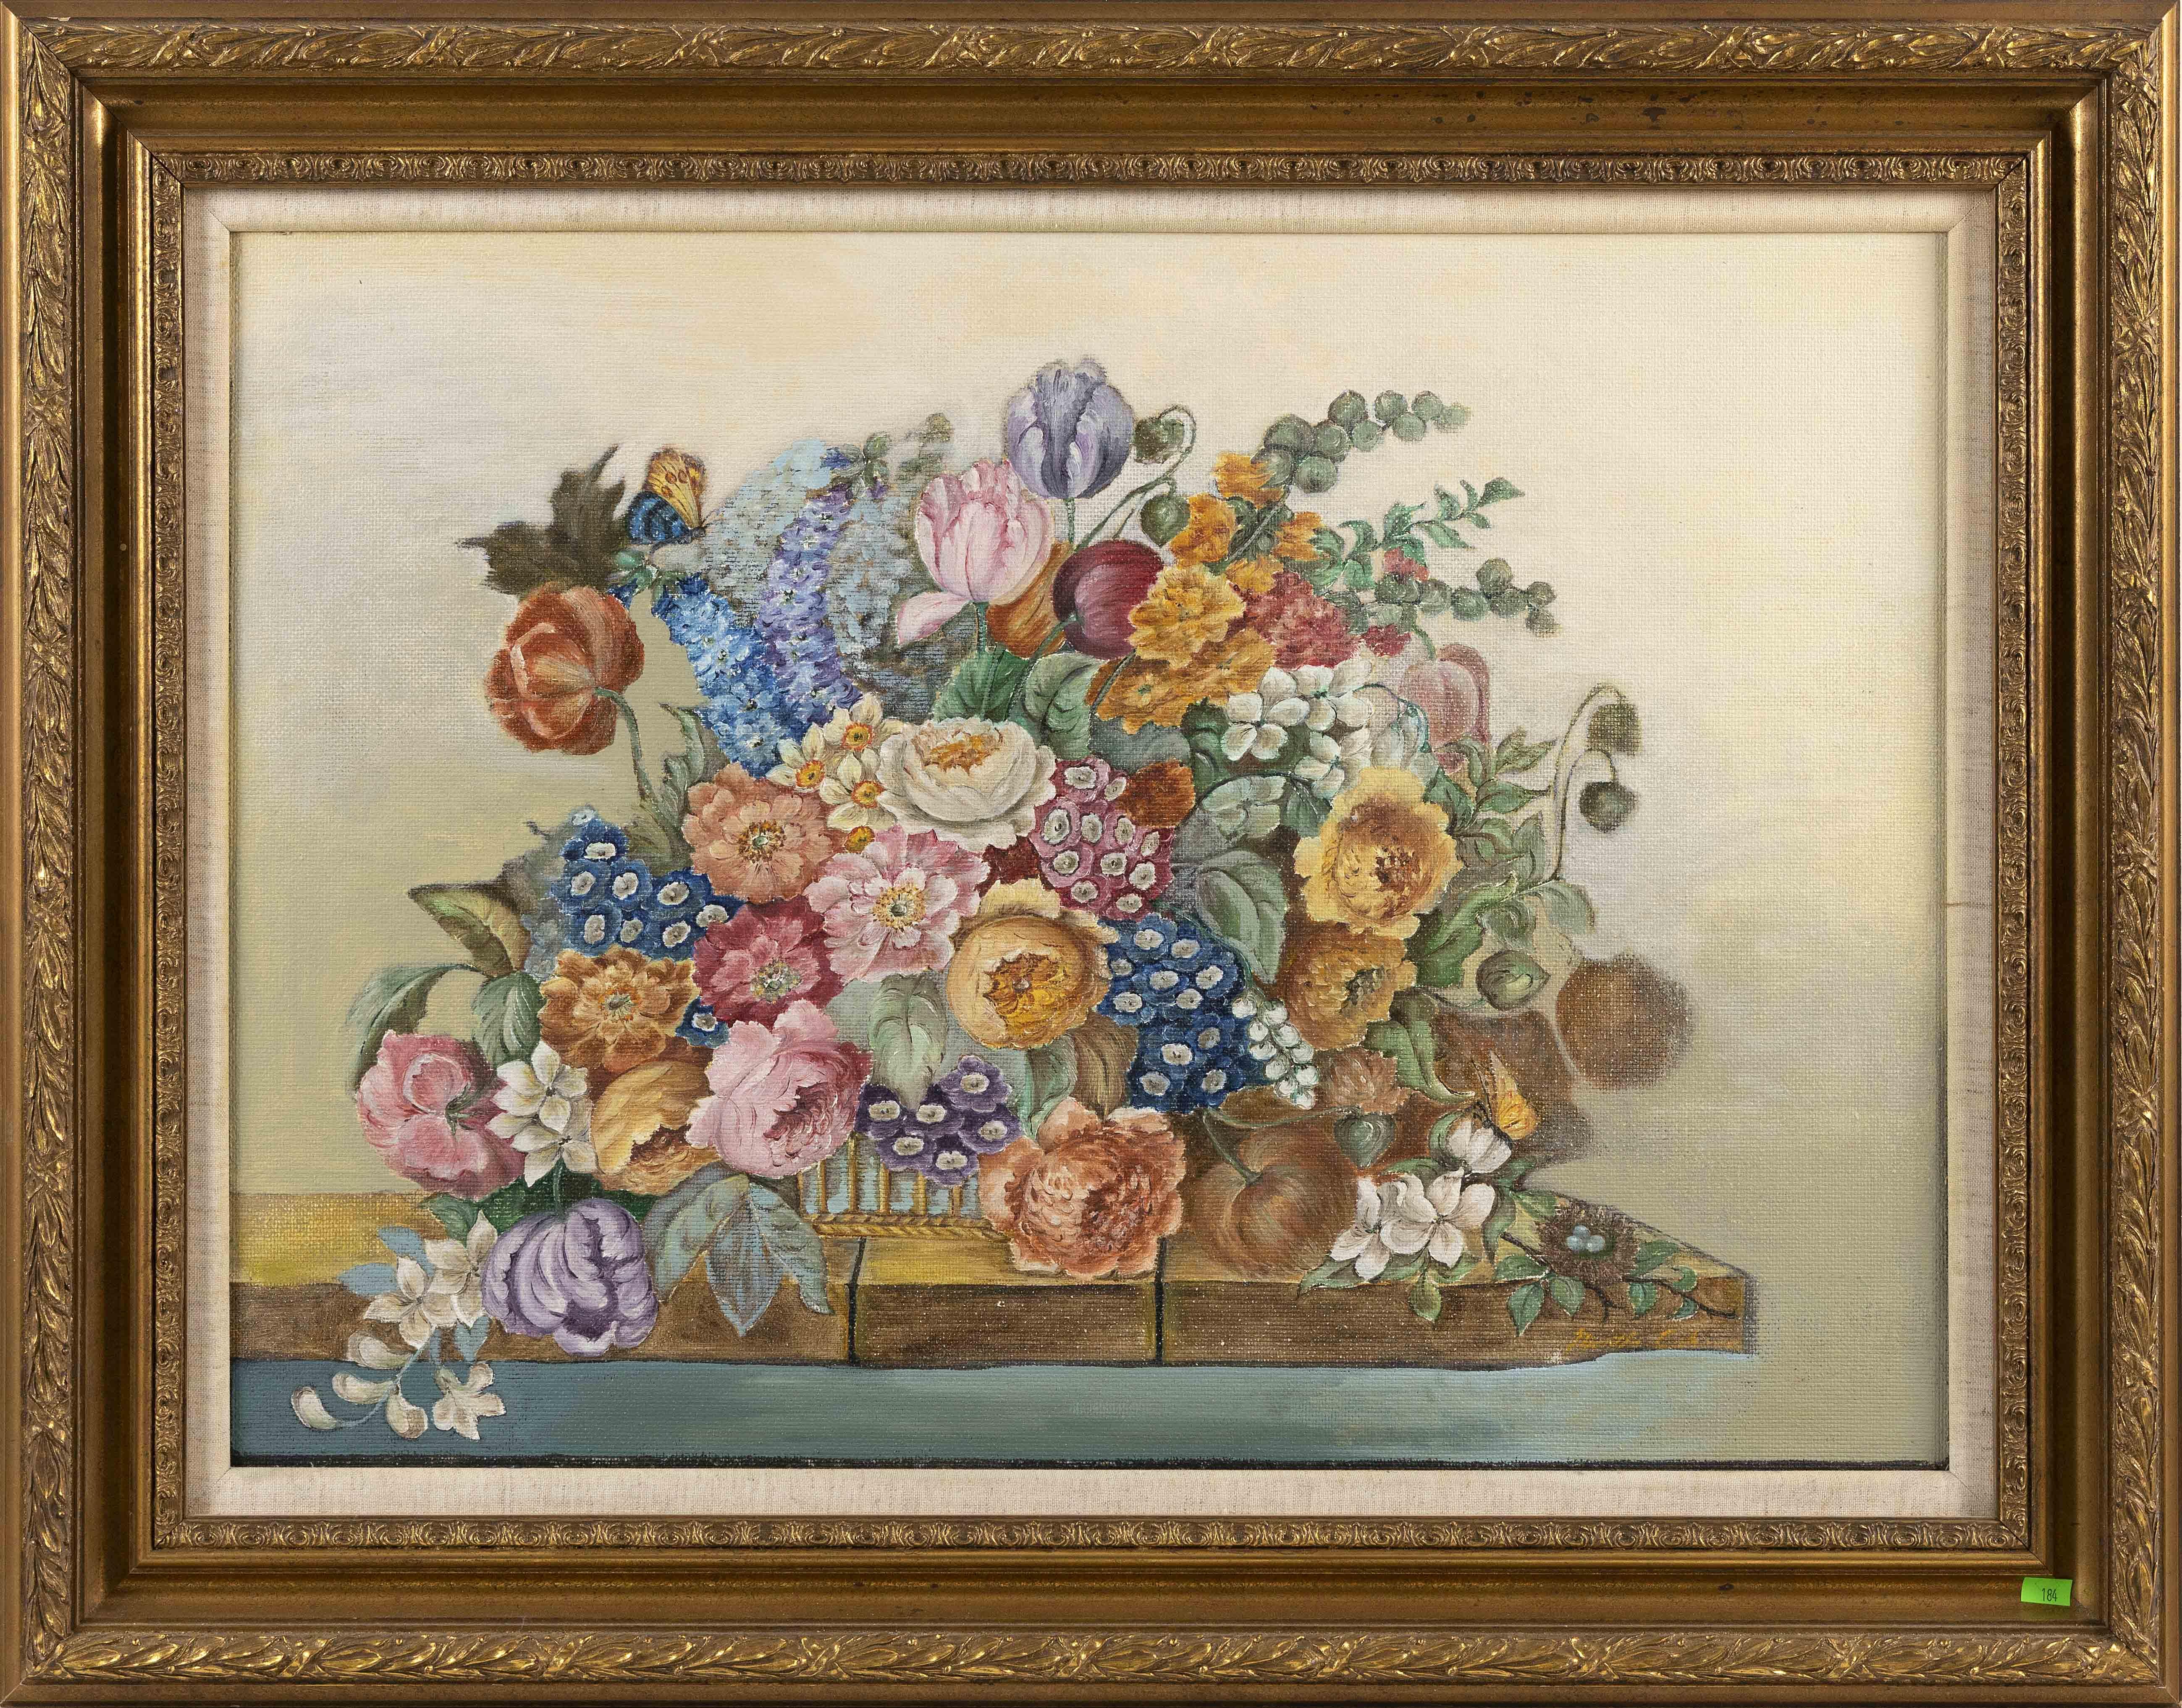 MANNER OF MARTHA CAHOON (20th Century,), Floral still life., Oil on masonite, 20